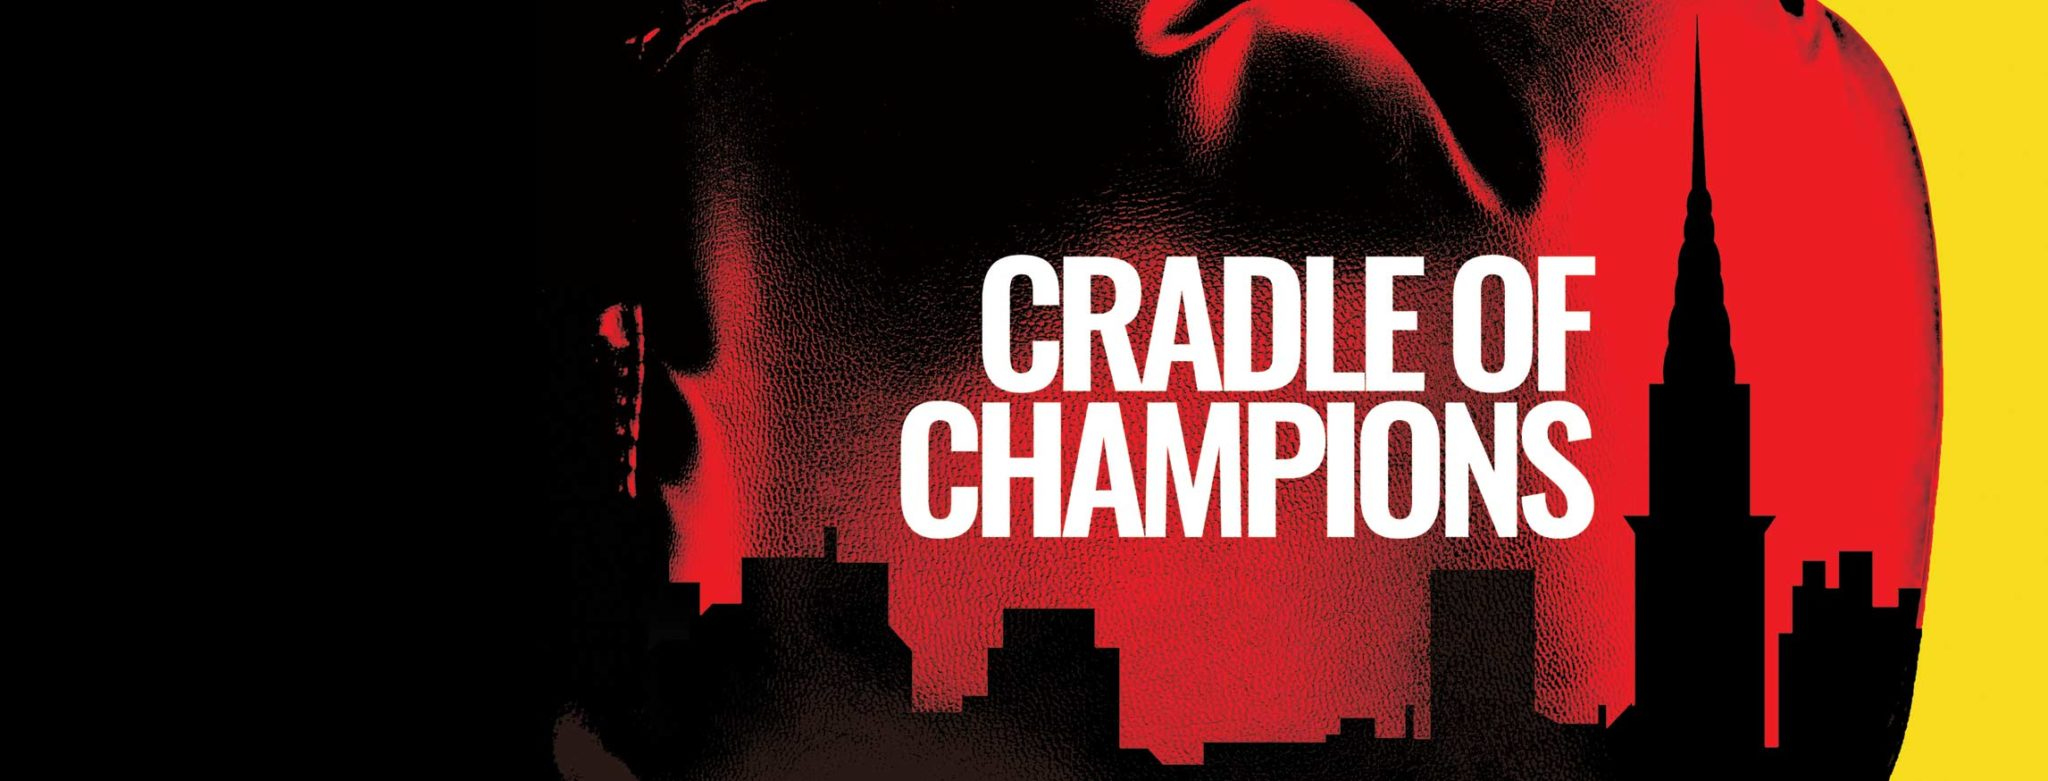 Cradle of Champions